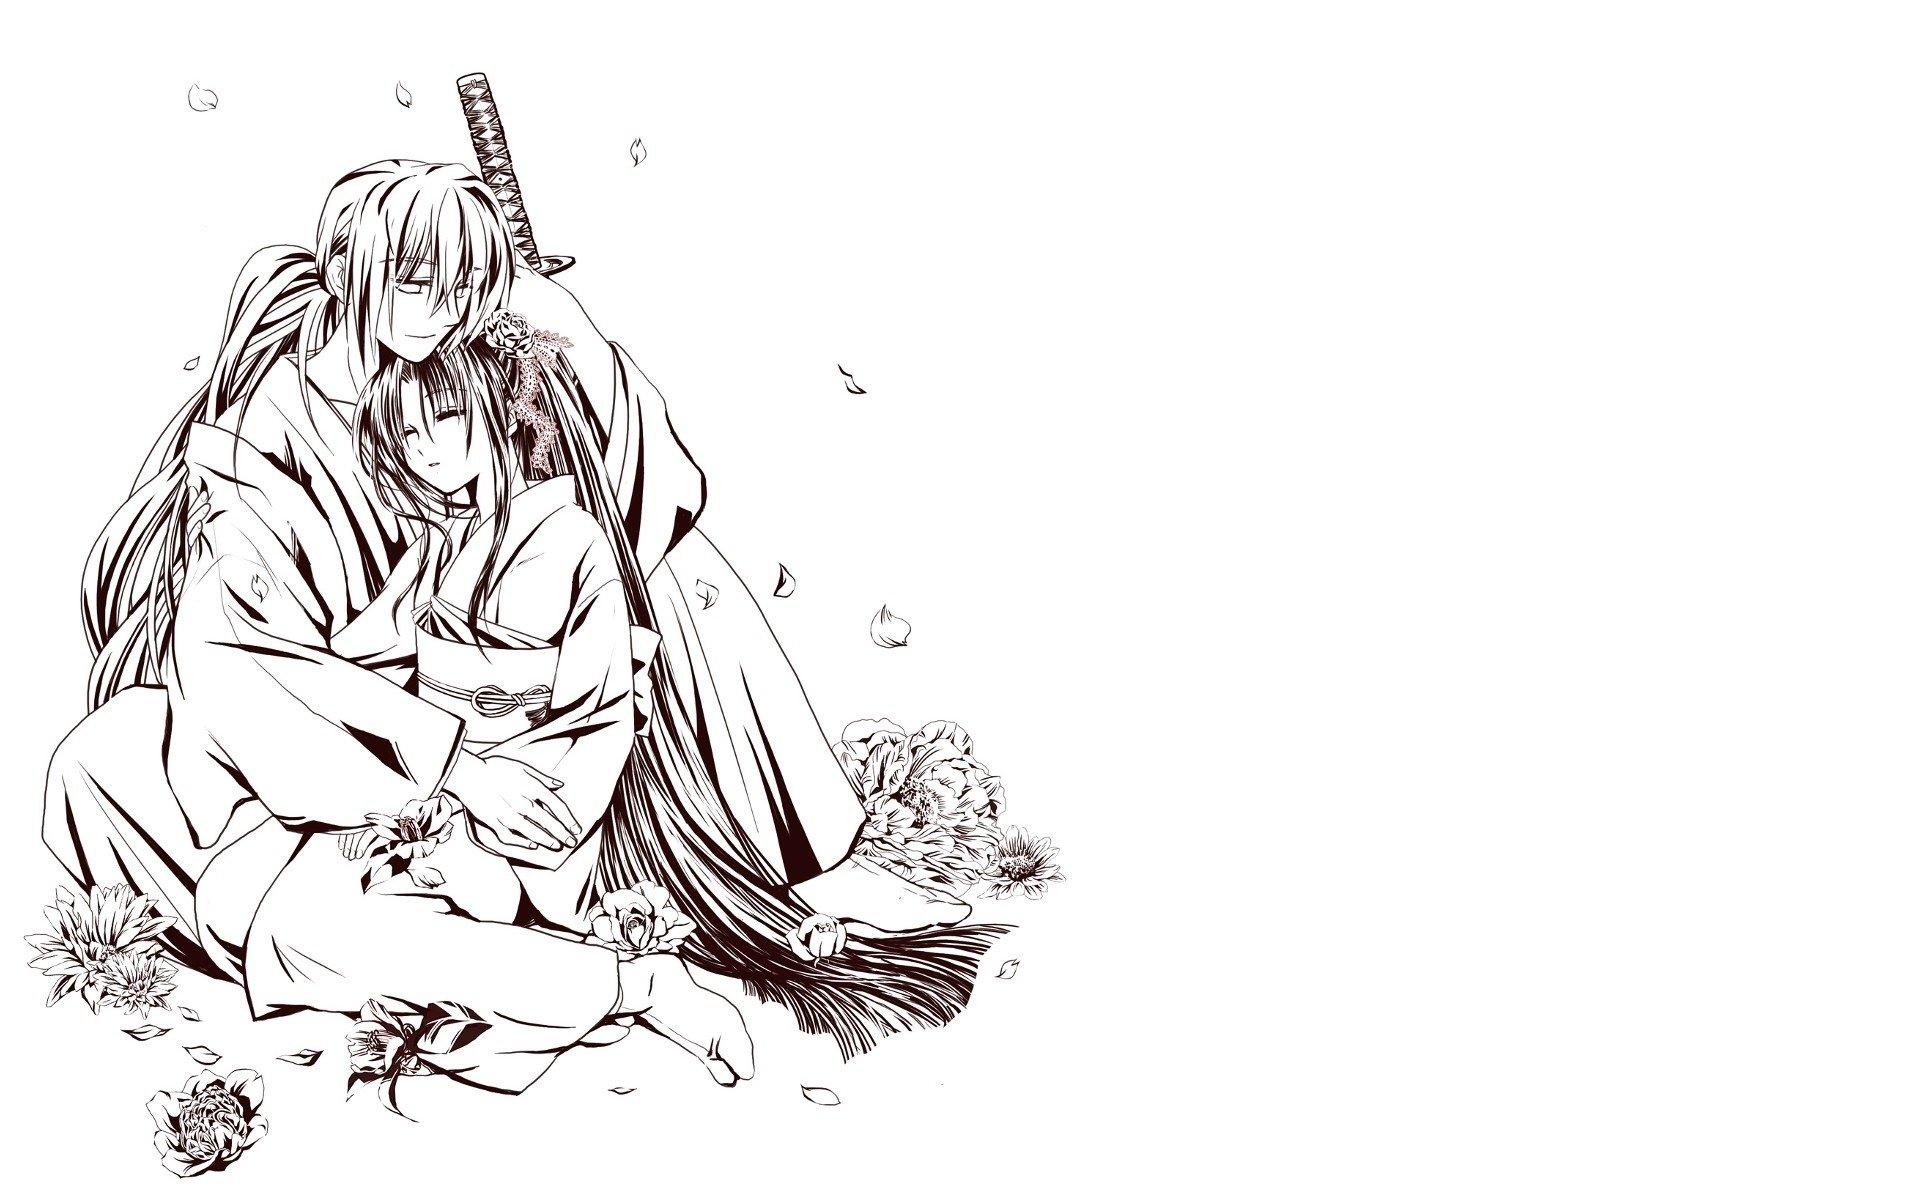 51 Rurouni Kenshin HD Wallpapers Backgrounds Wallpaper Abyss